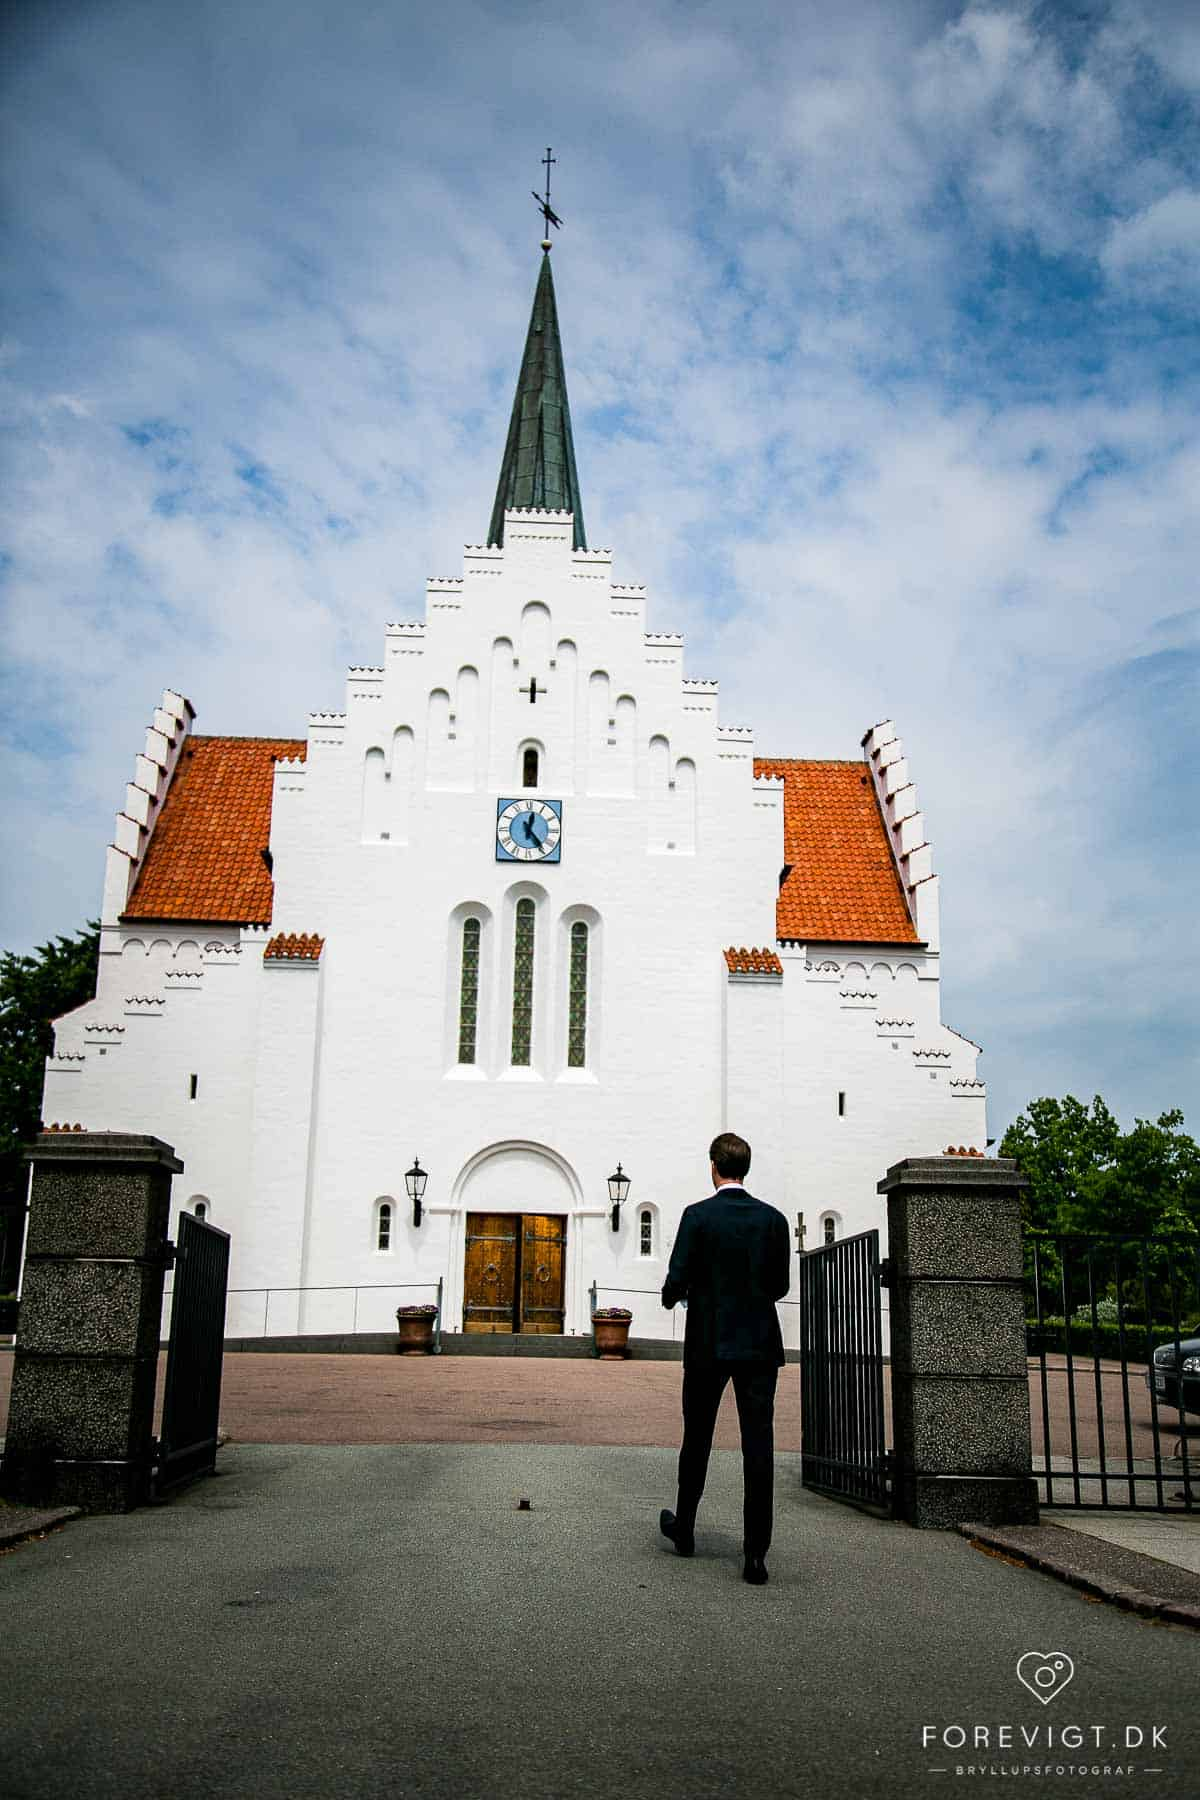 Bryllupsfotografering: Bryllupsfotograf Aarhus ...